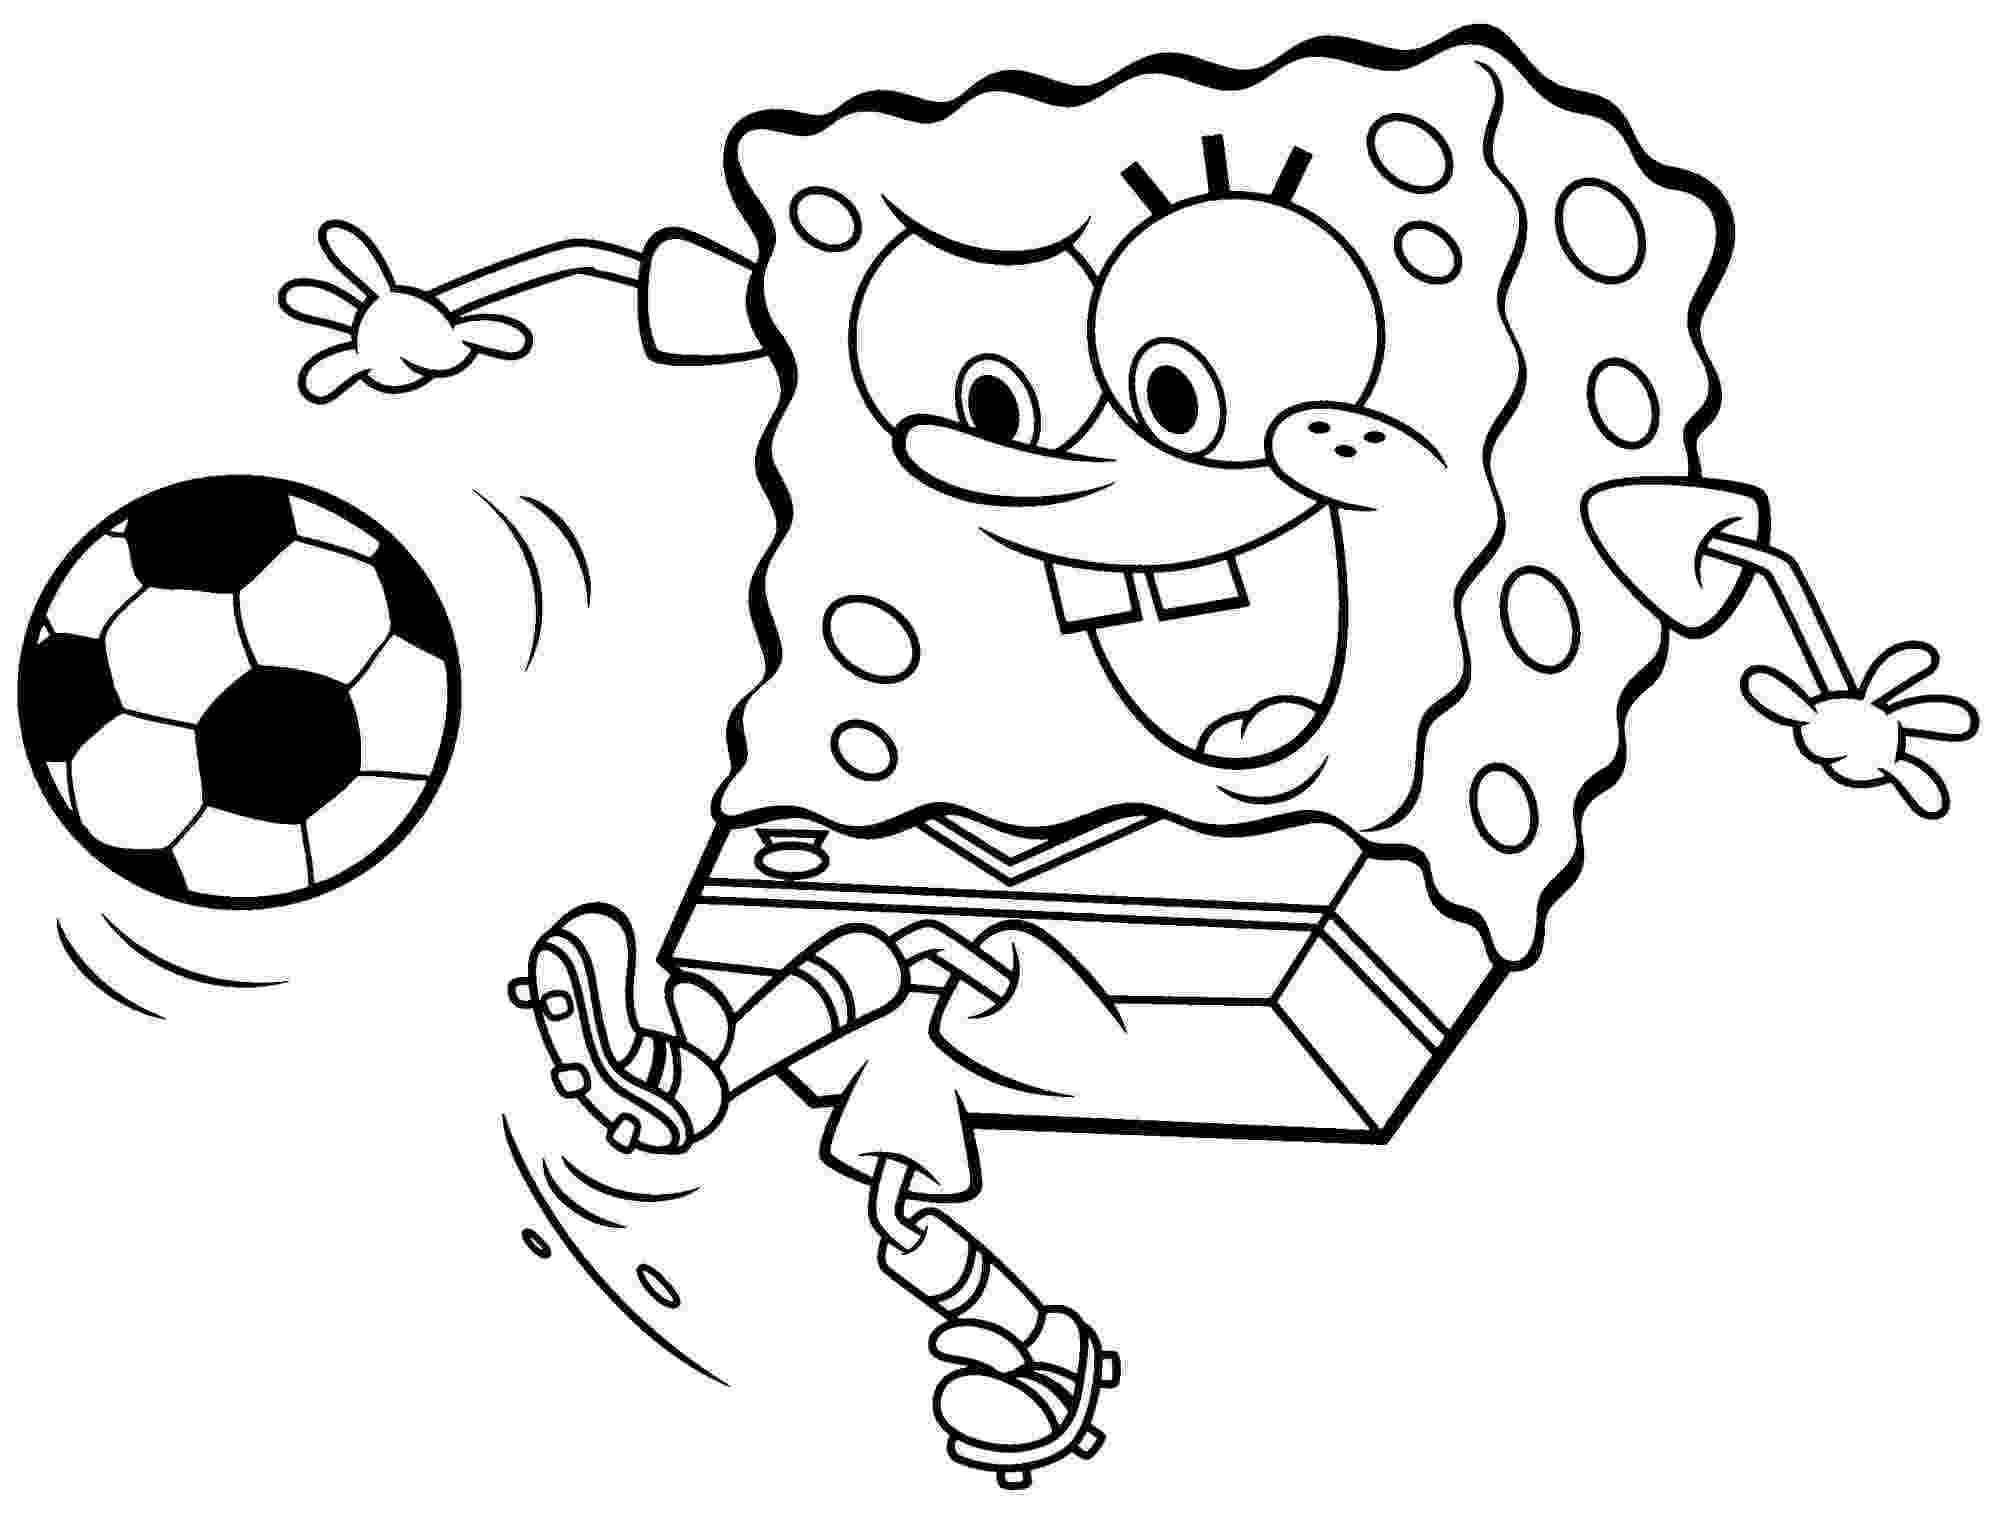 sponge bob coloring page free printable spongebob squarepants coloring pages for kids coloring sponge page bob